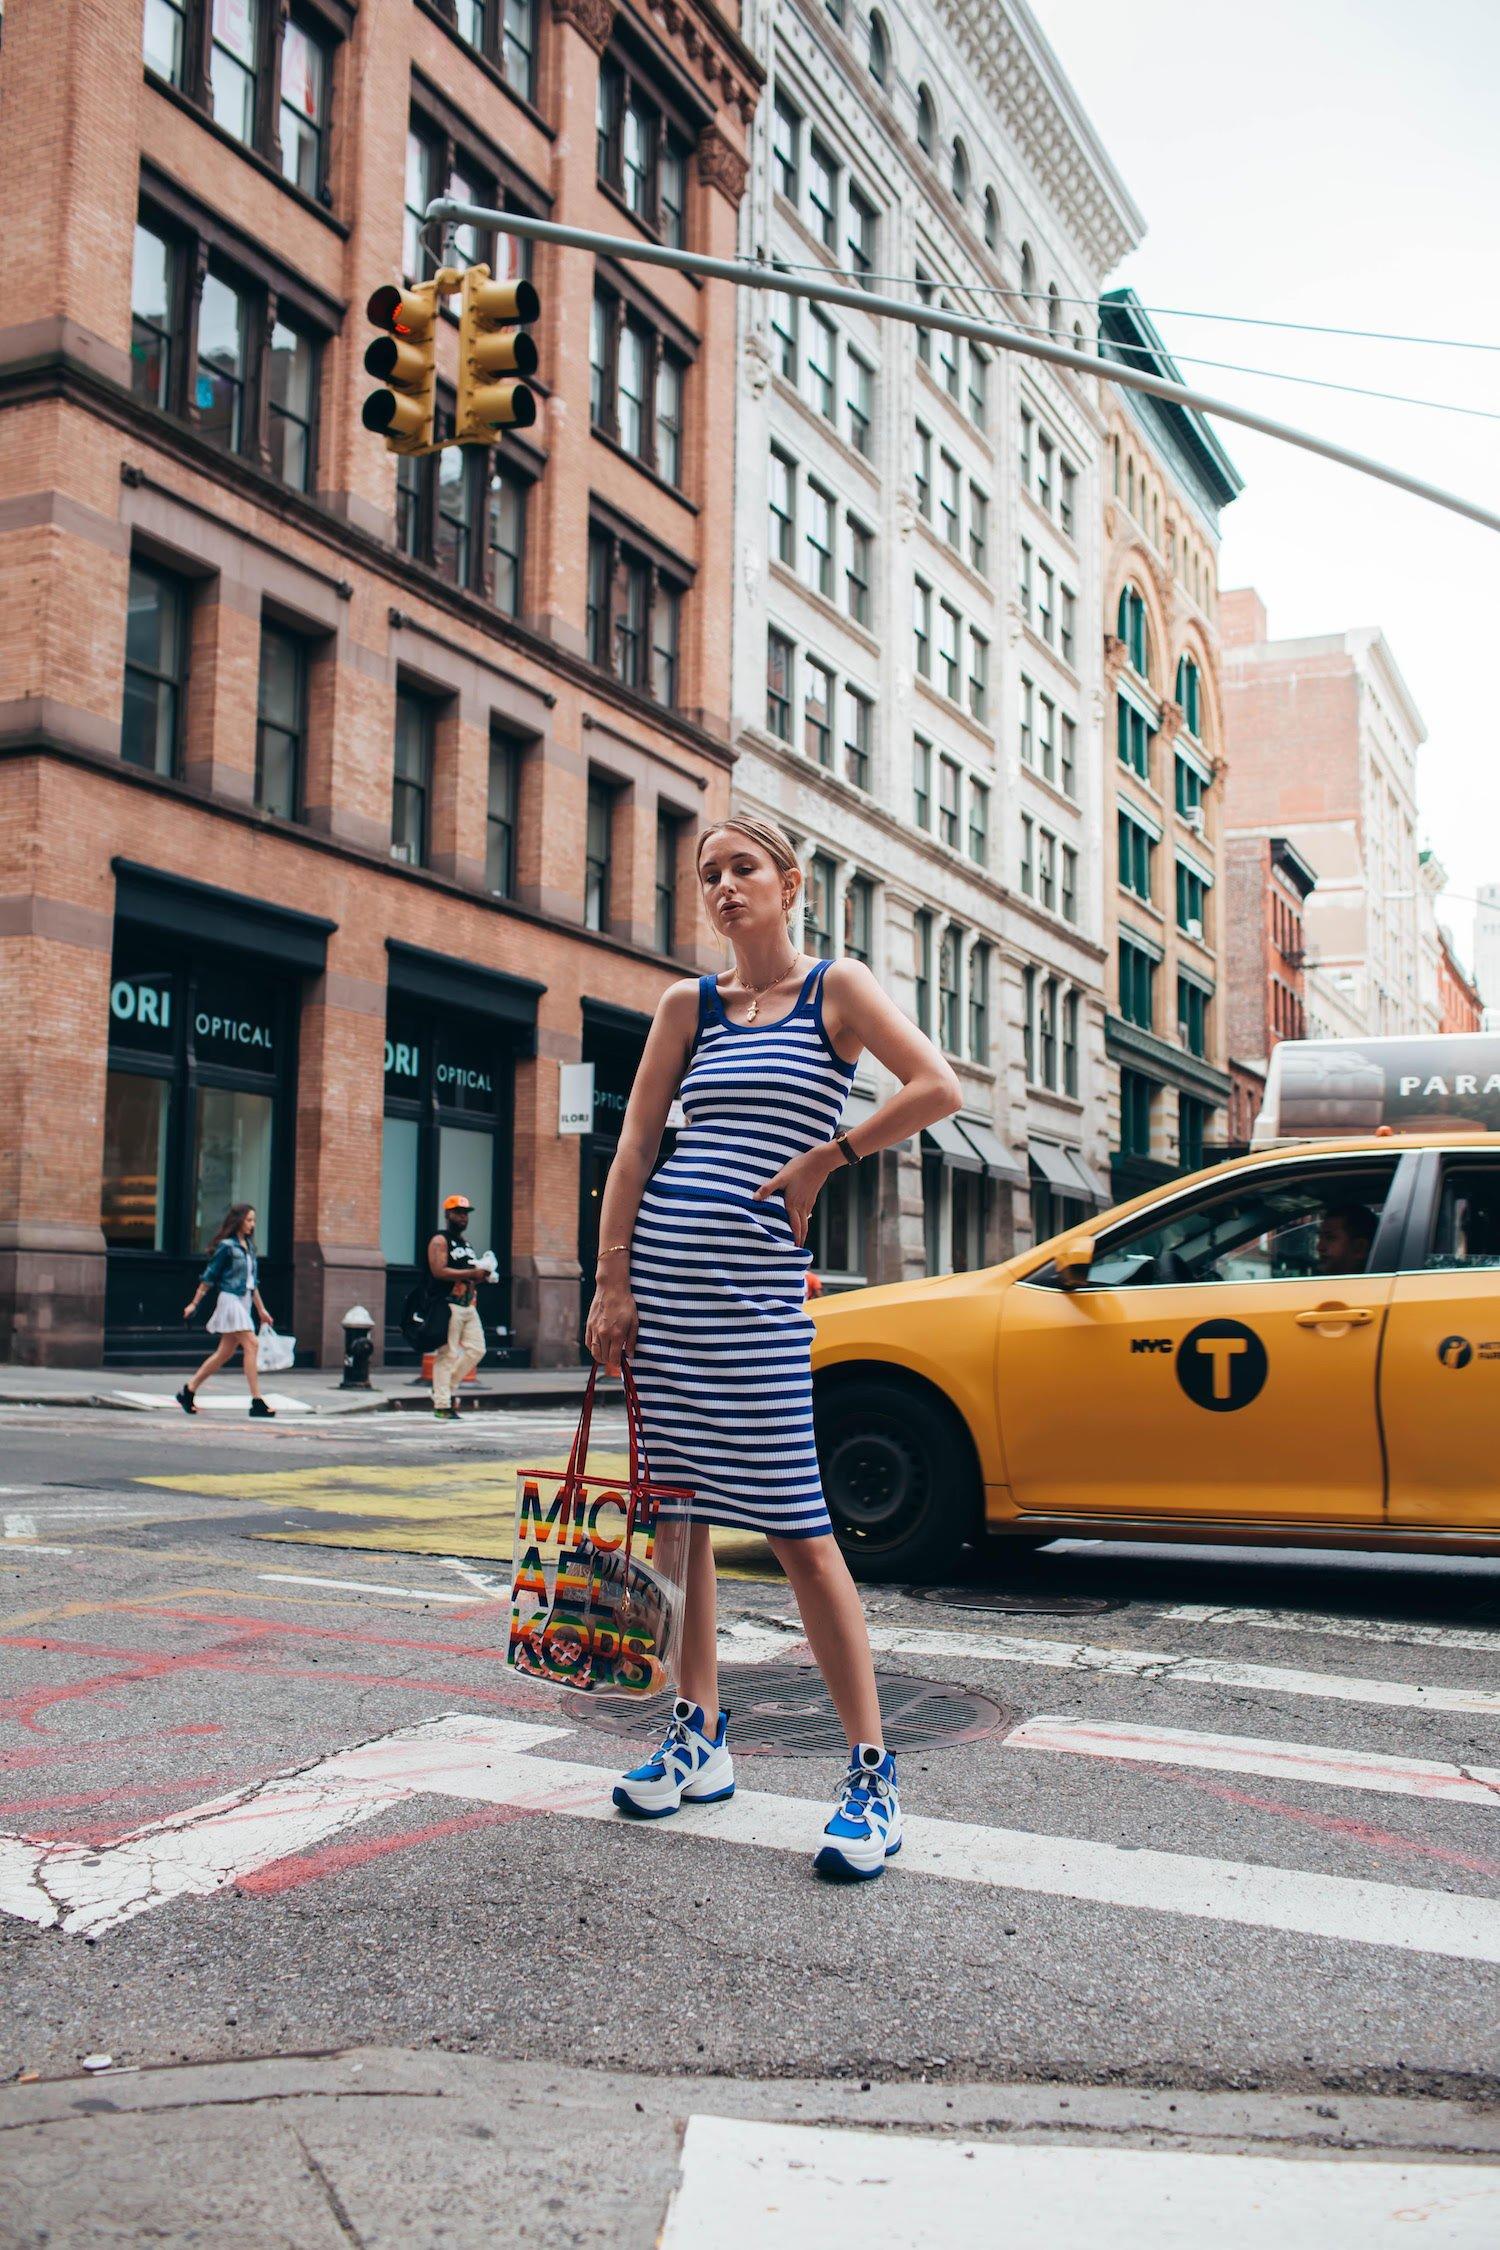 NYC STREET LOCATIONS